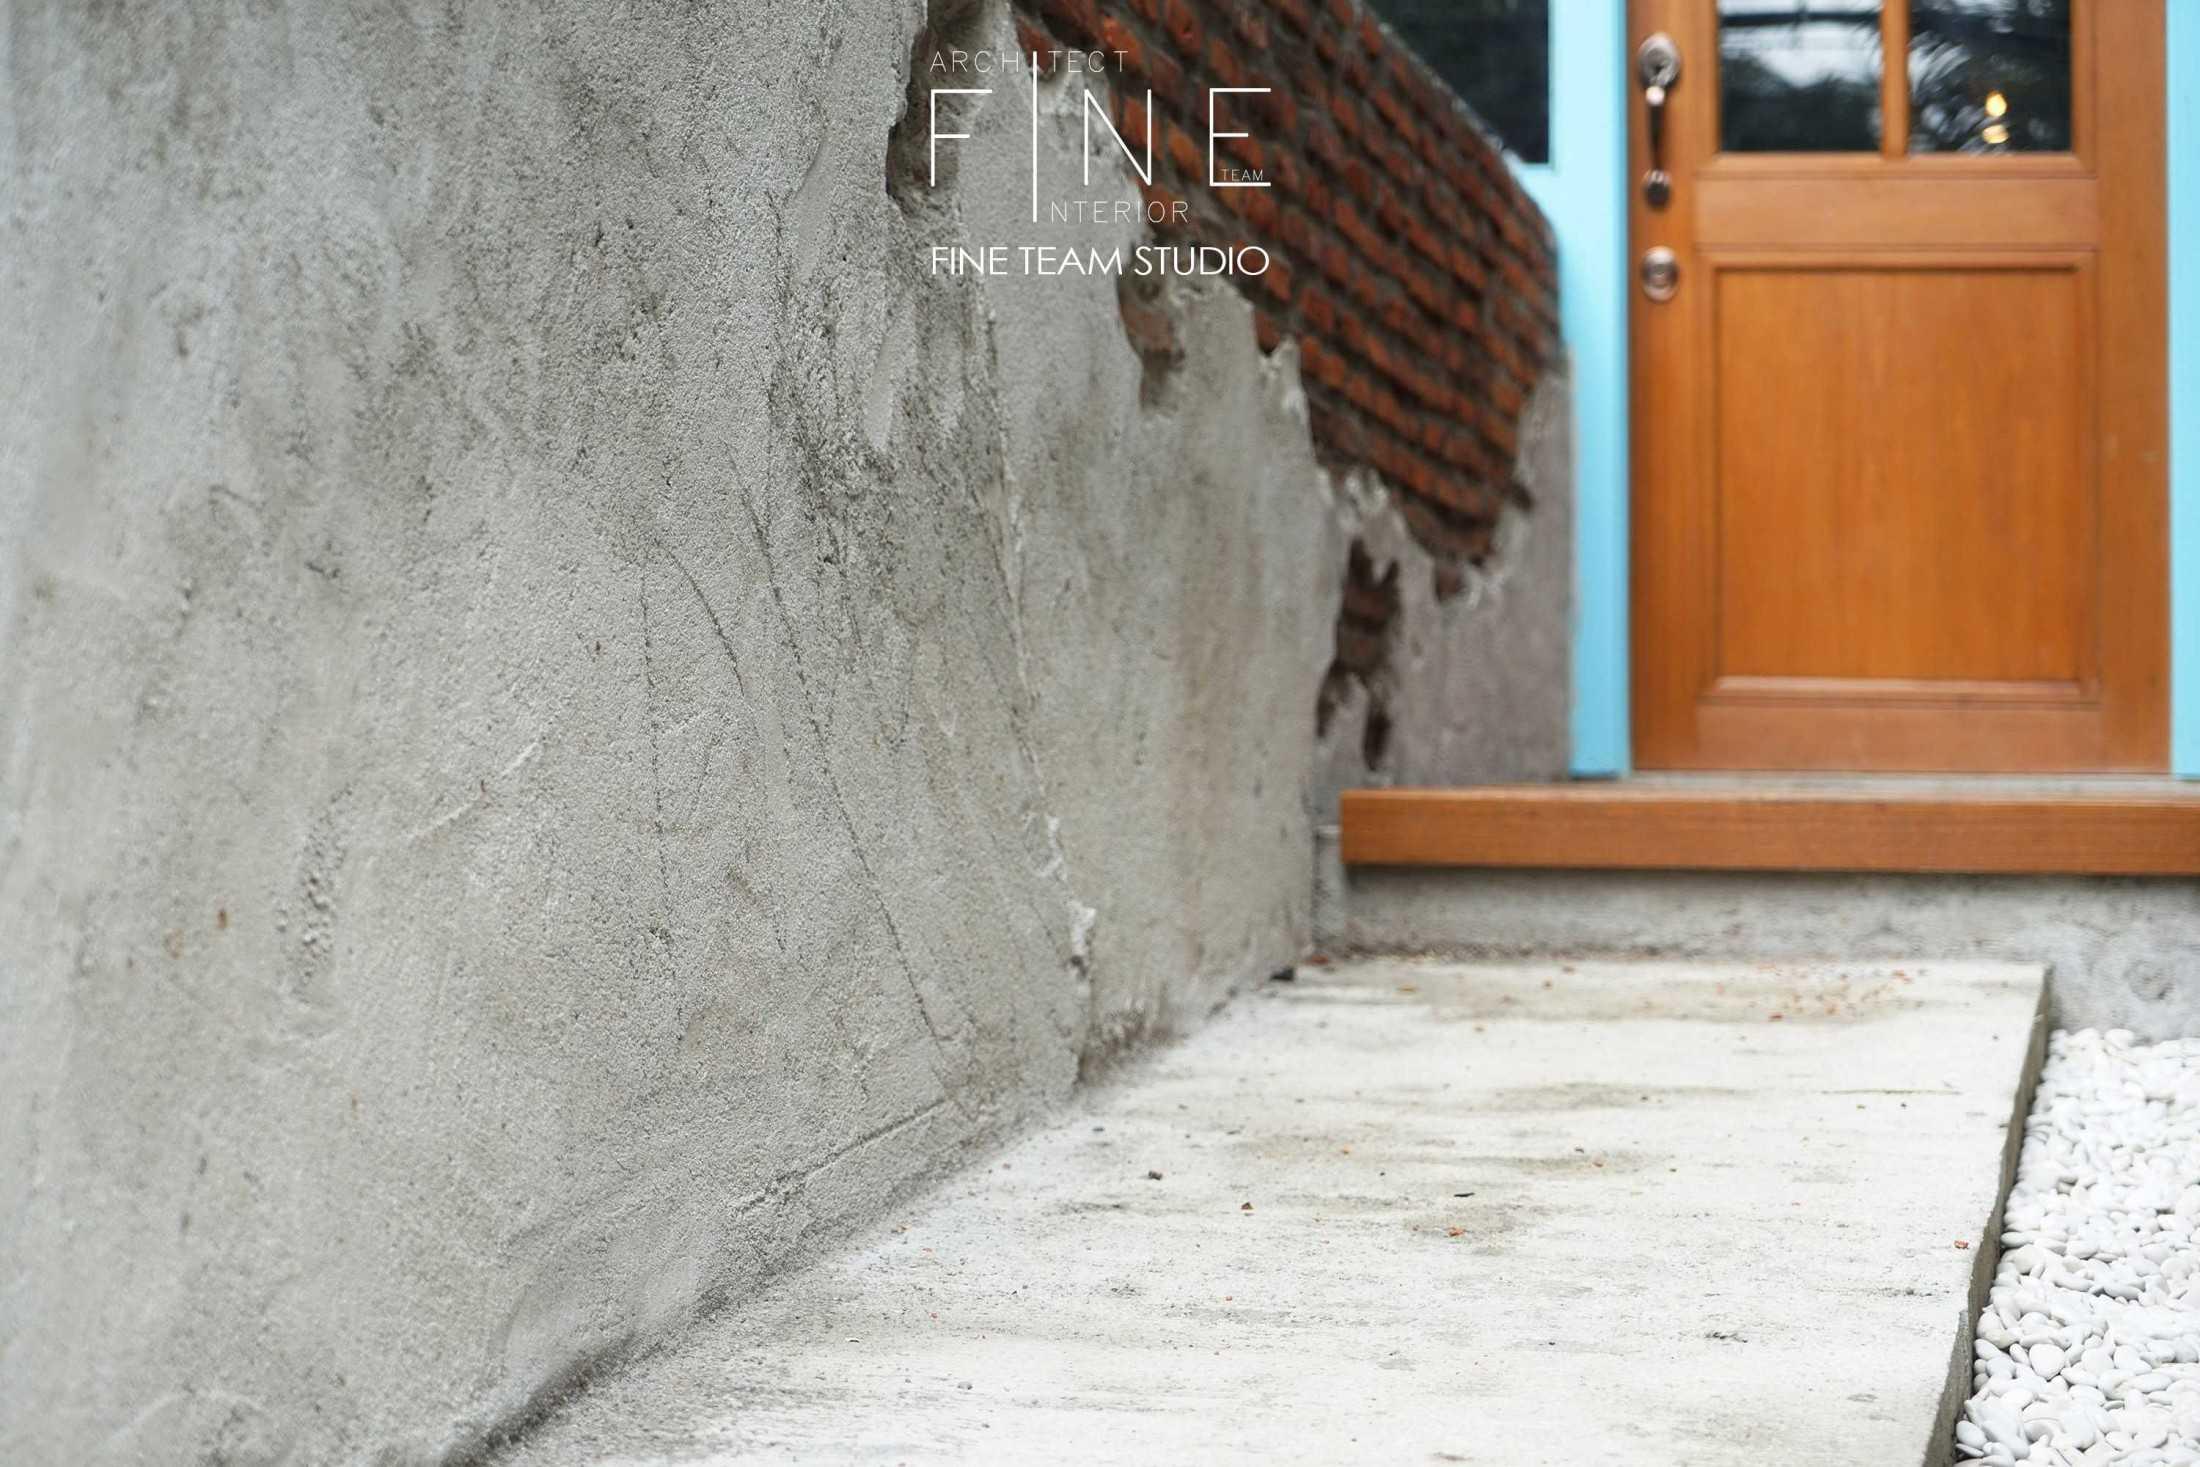 Fine Team Studio Delapan Gram Blok O, Jl. Pluit Karang Bar. No.6 No. 14, Rt.2/rw.8, Pluit, Penjaringan, Jakarta, Daerah Khusus Ibukota Jakarta 14450, Indonesia Blok O, Jl. Pluit Karang Bar. No.6 No. 14, Rt.2/rw.8, Pluit, Penjaringan, Jakarta, Daerah Khusus Ibukota Jakarta 14450, Indonesia Fine-Team-Studio-Delapan-Gram Industrial 56091